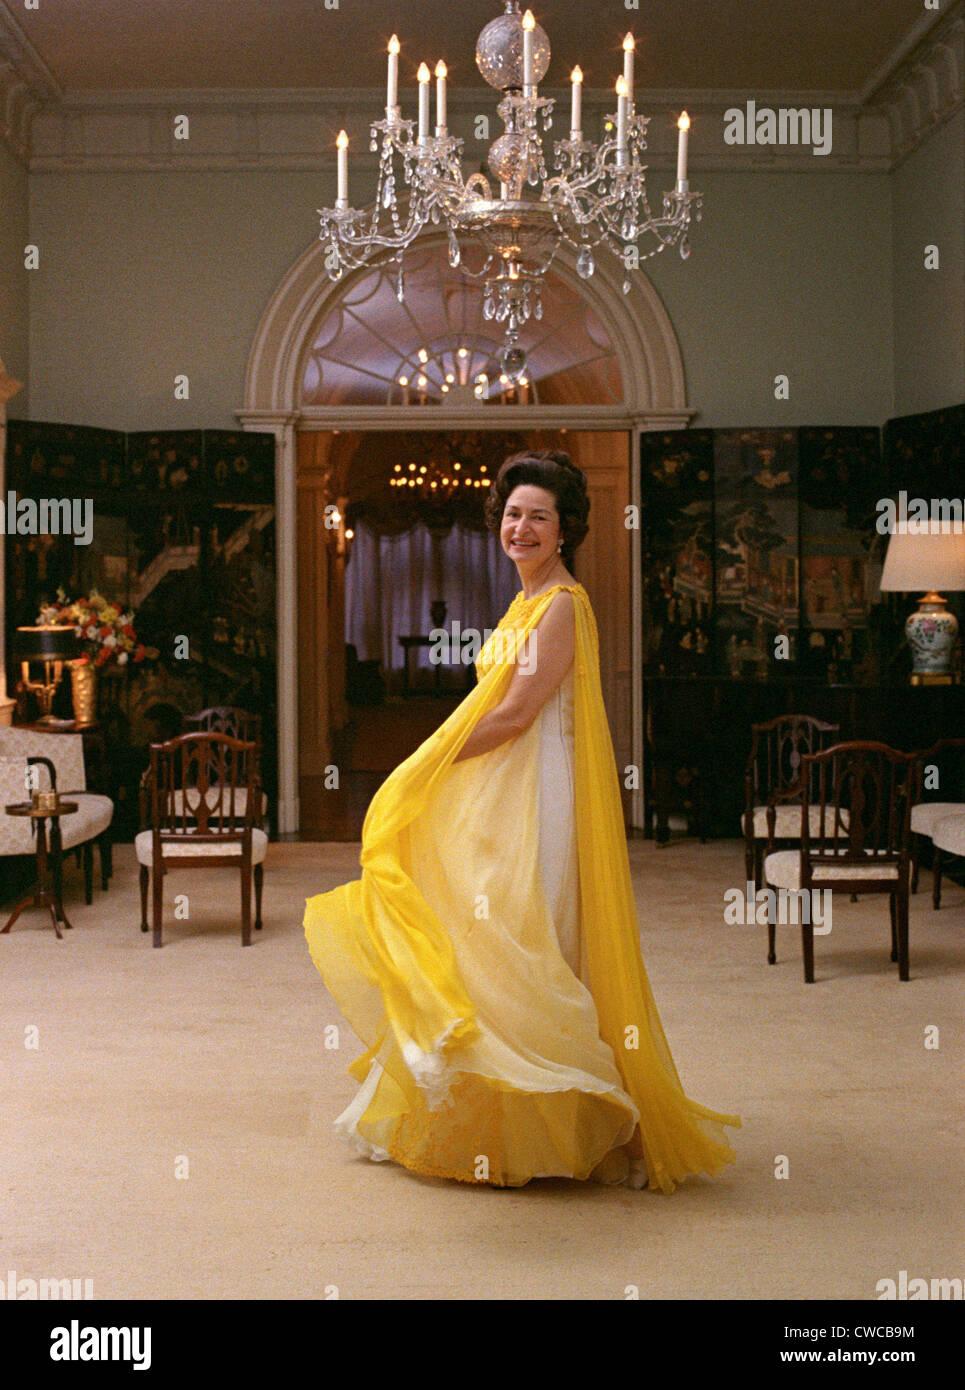 Draped Dress Stockfotos & Draped Dress Bilder - Alamy